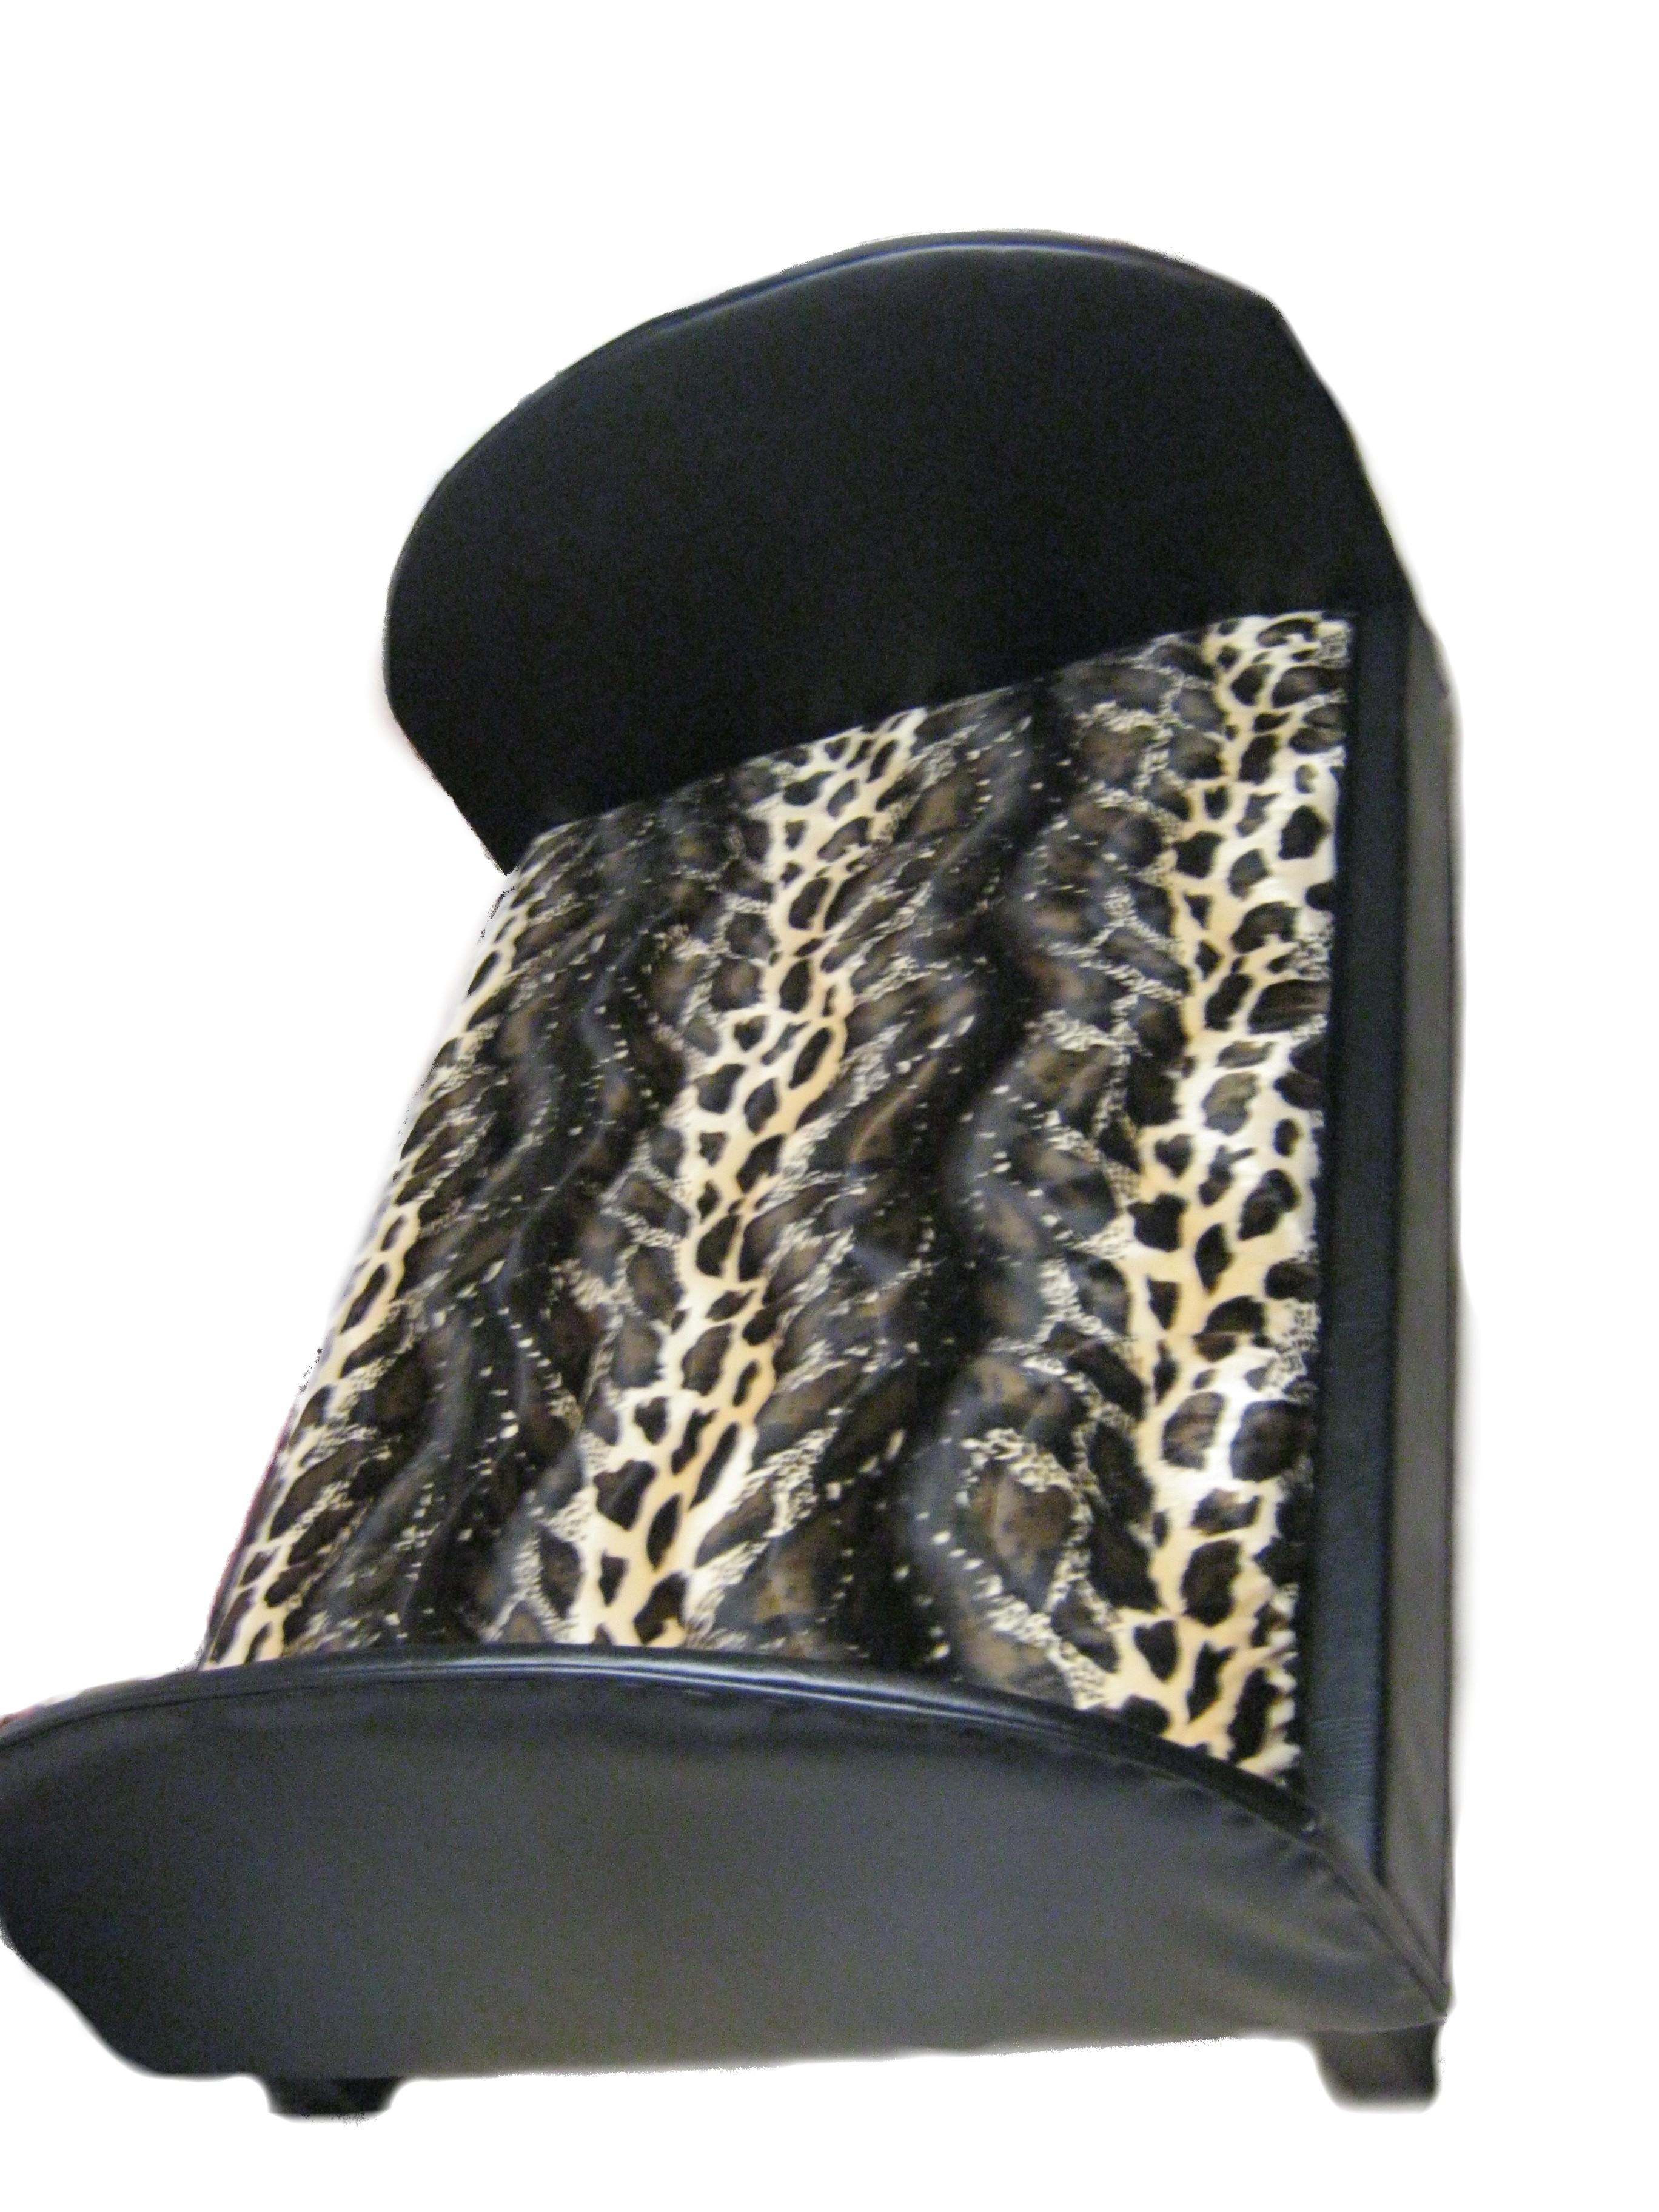 Large Brown Cheetah Dog Bed